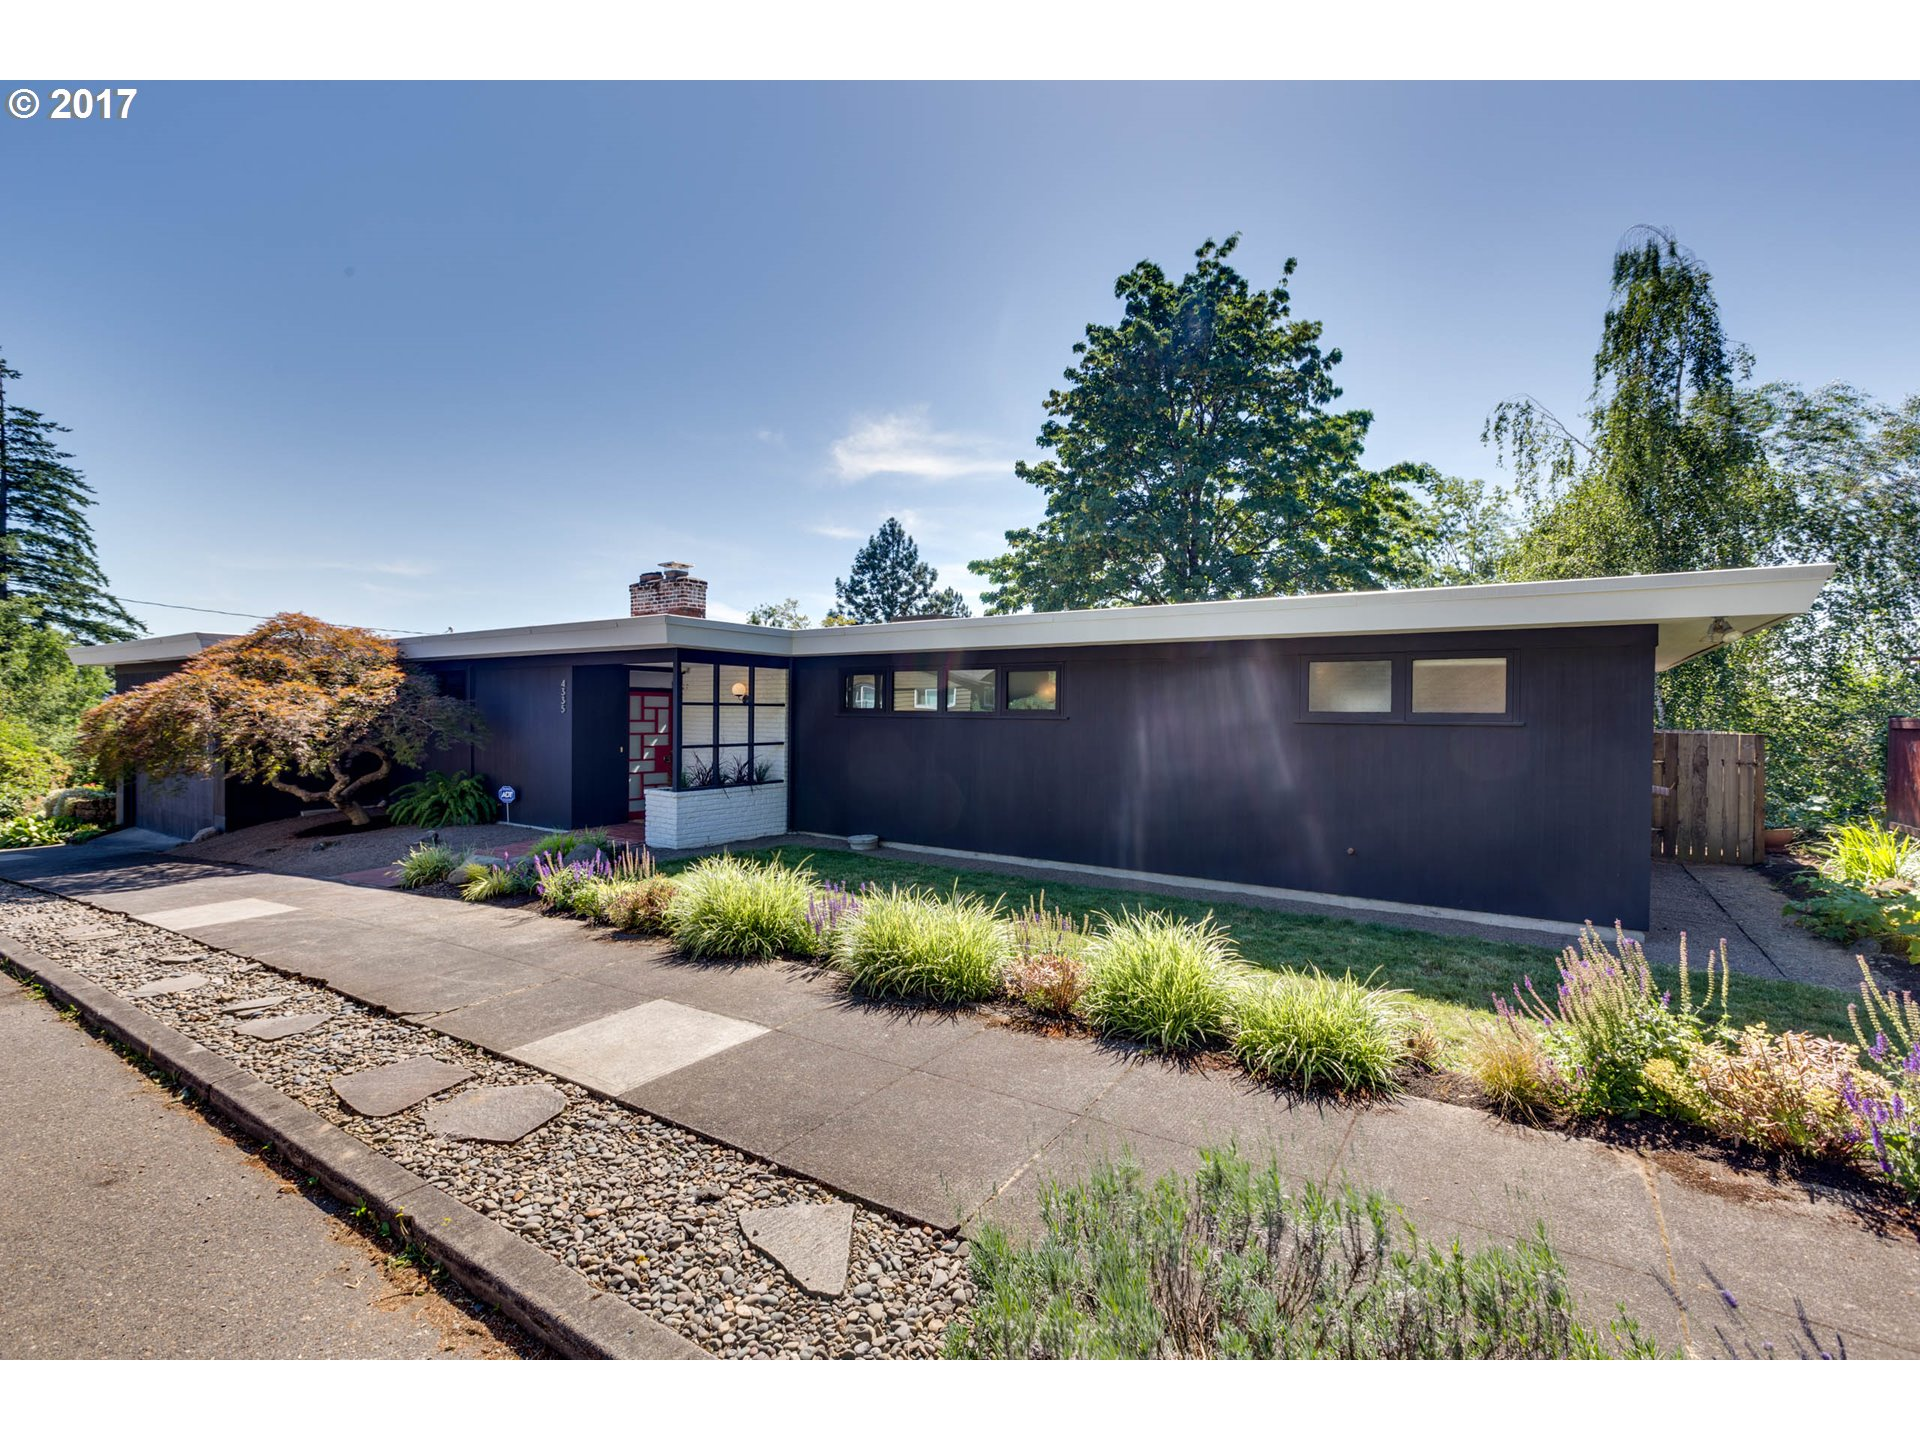 4335 SW ALTADENA AVE, Portland, OR 97239